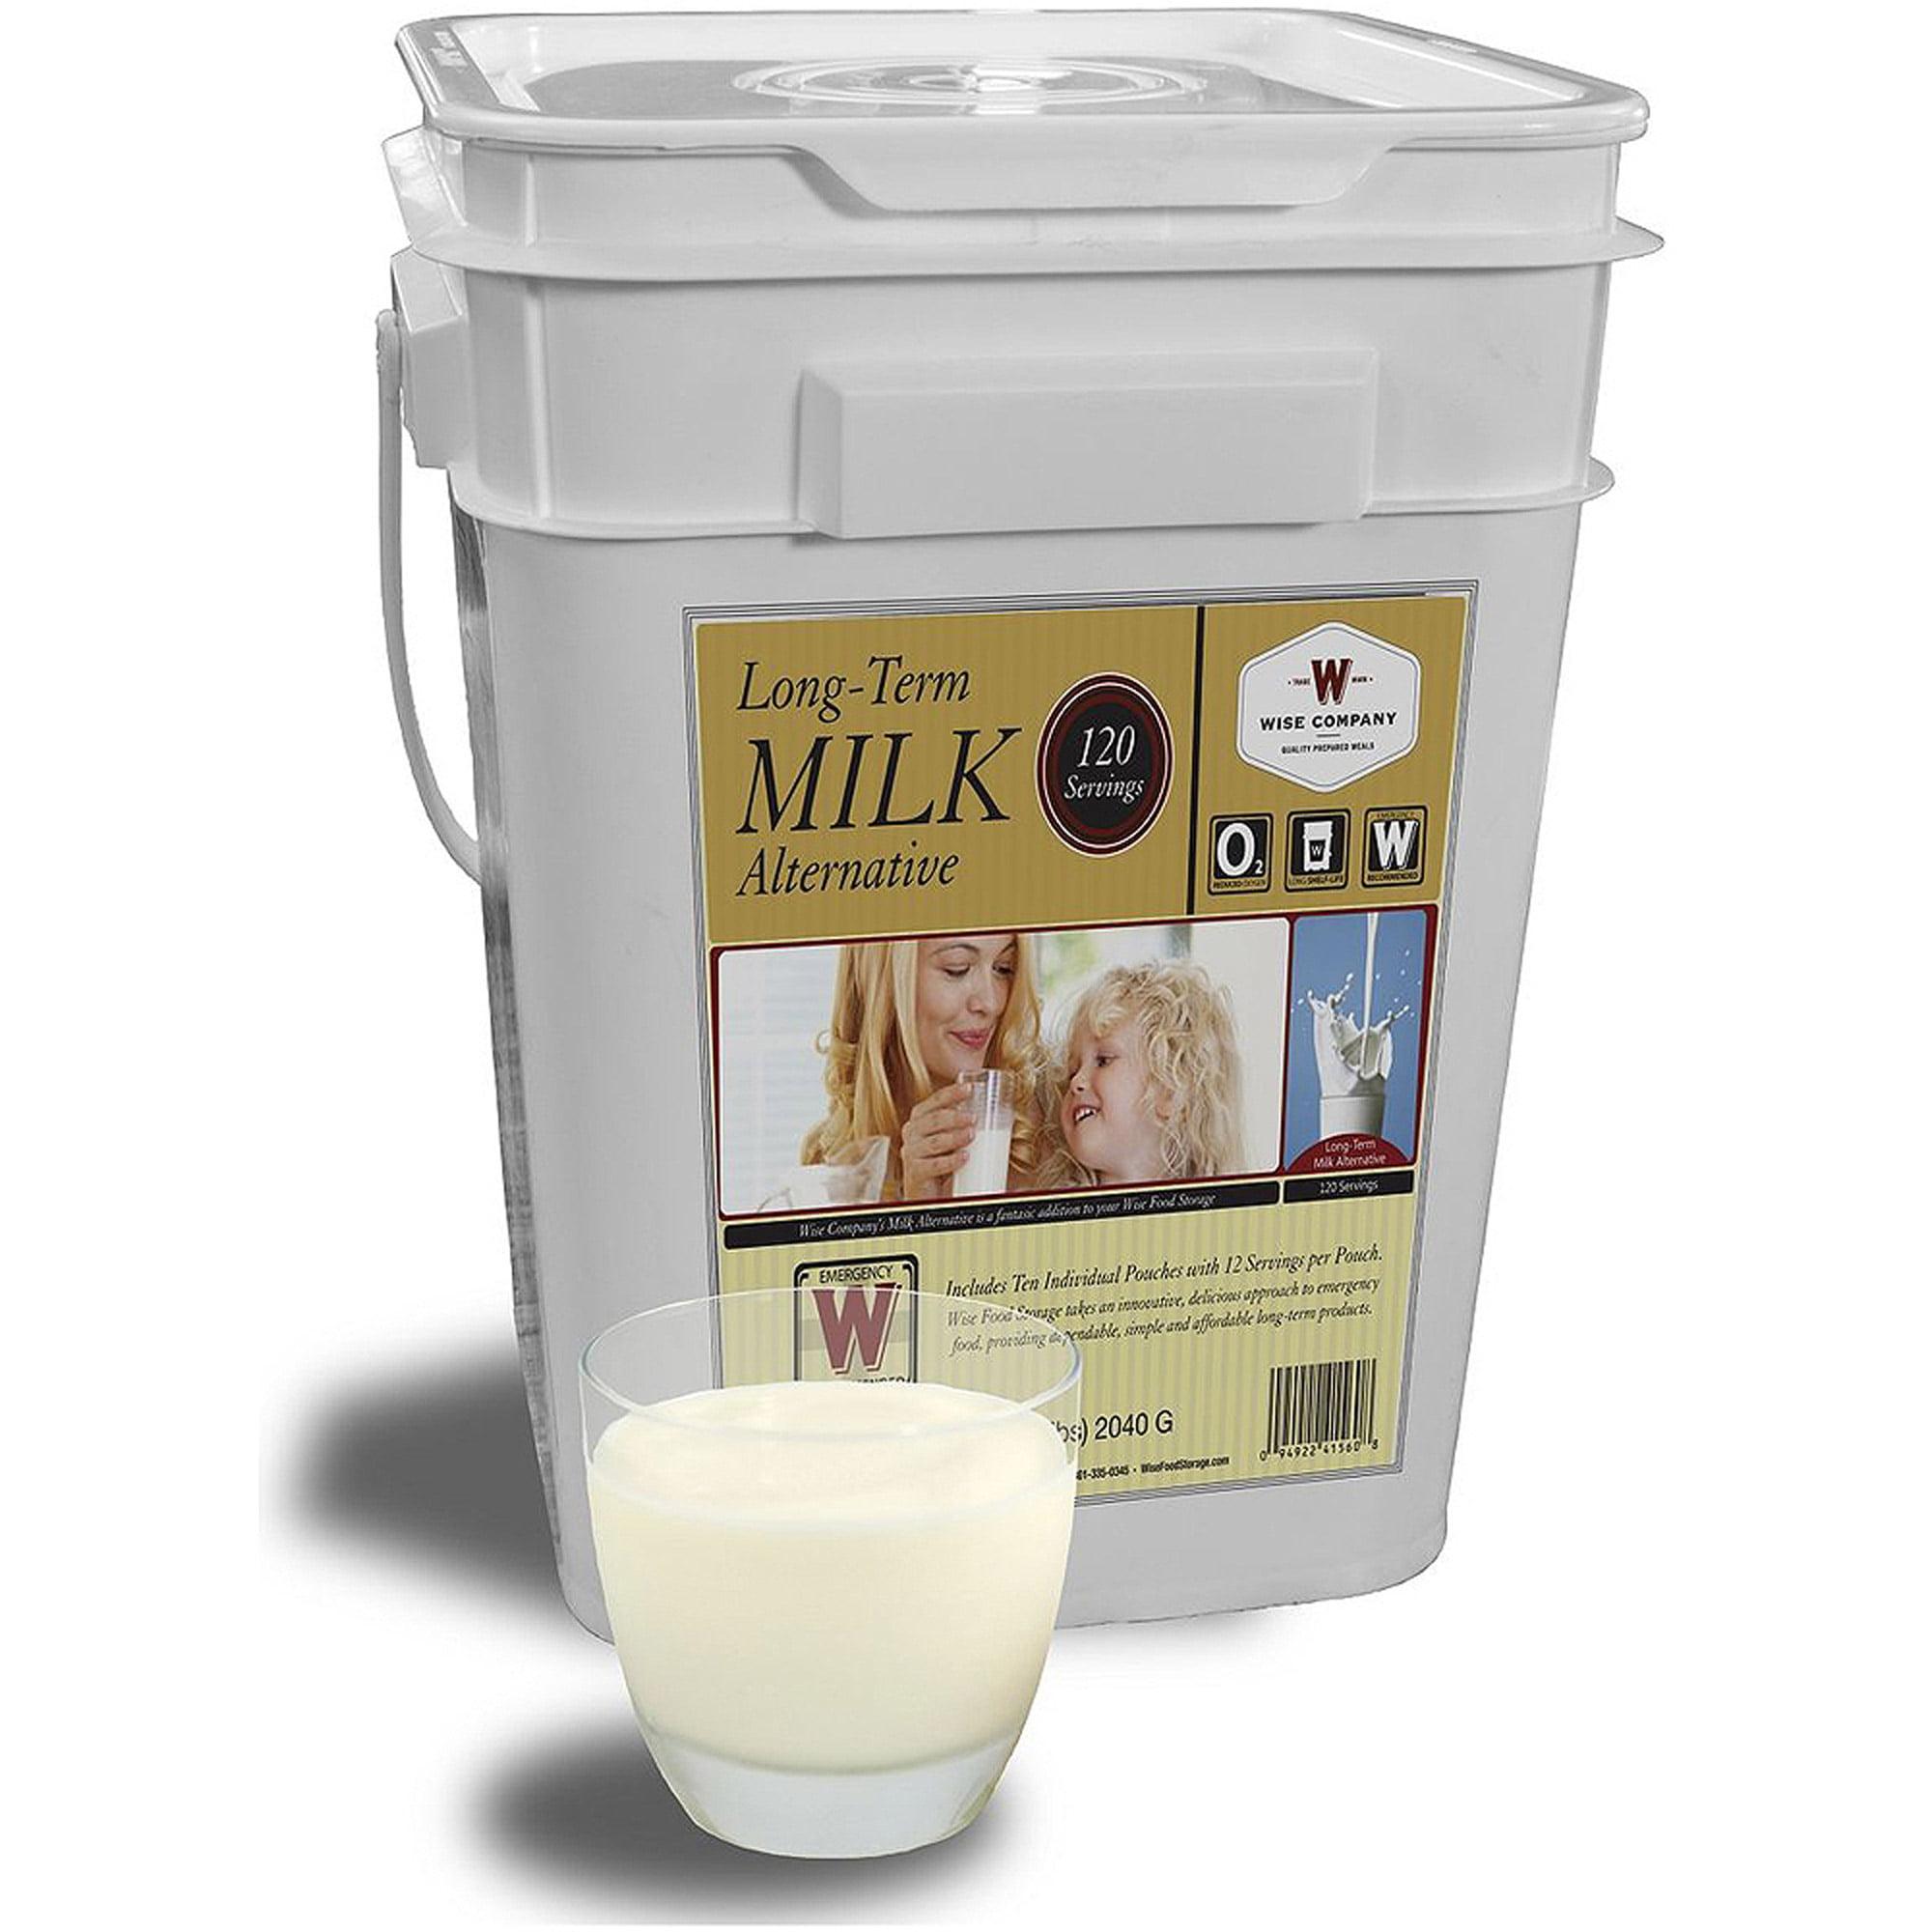 Wise Emergency Freeze Dried Powdered Whey Milk - 120 Servings